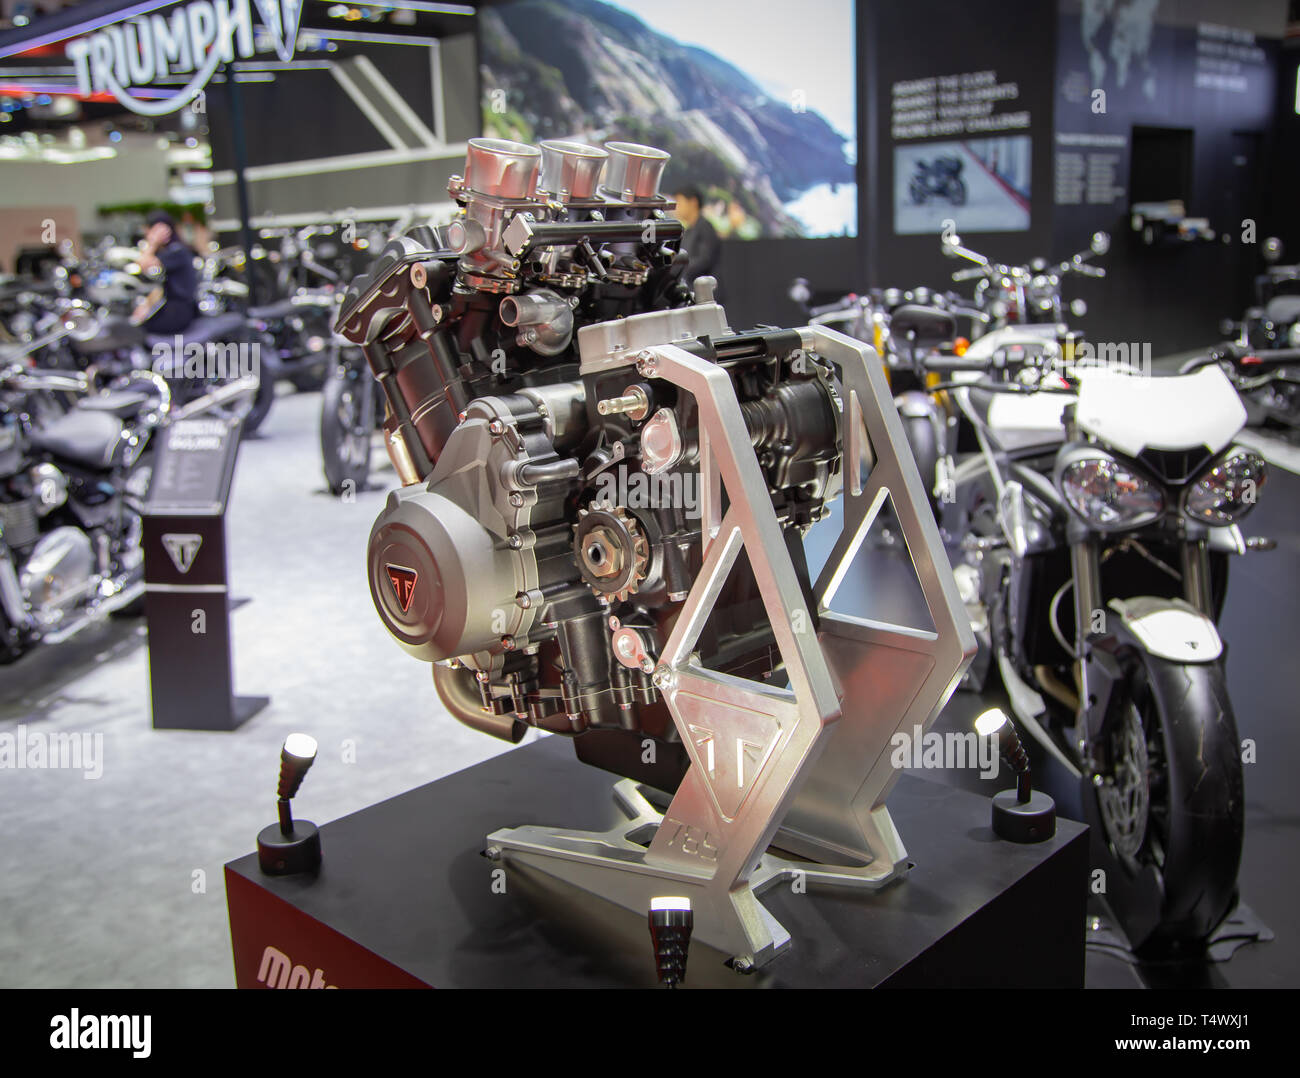 Nonthaburi, Thailand - April 3, 2019: Triumph Moto2 765 engine displayed in Motor Show 2019 - Stock Image